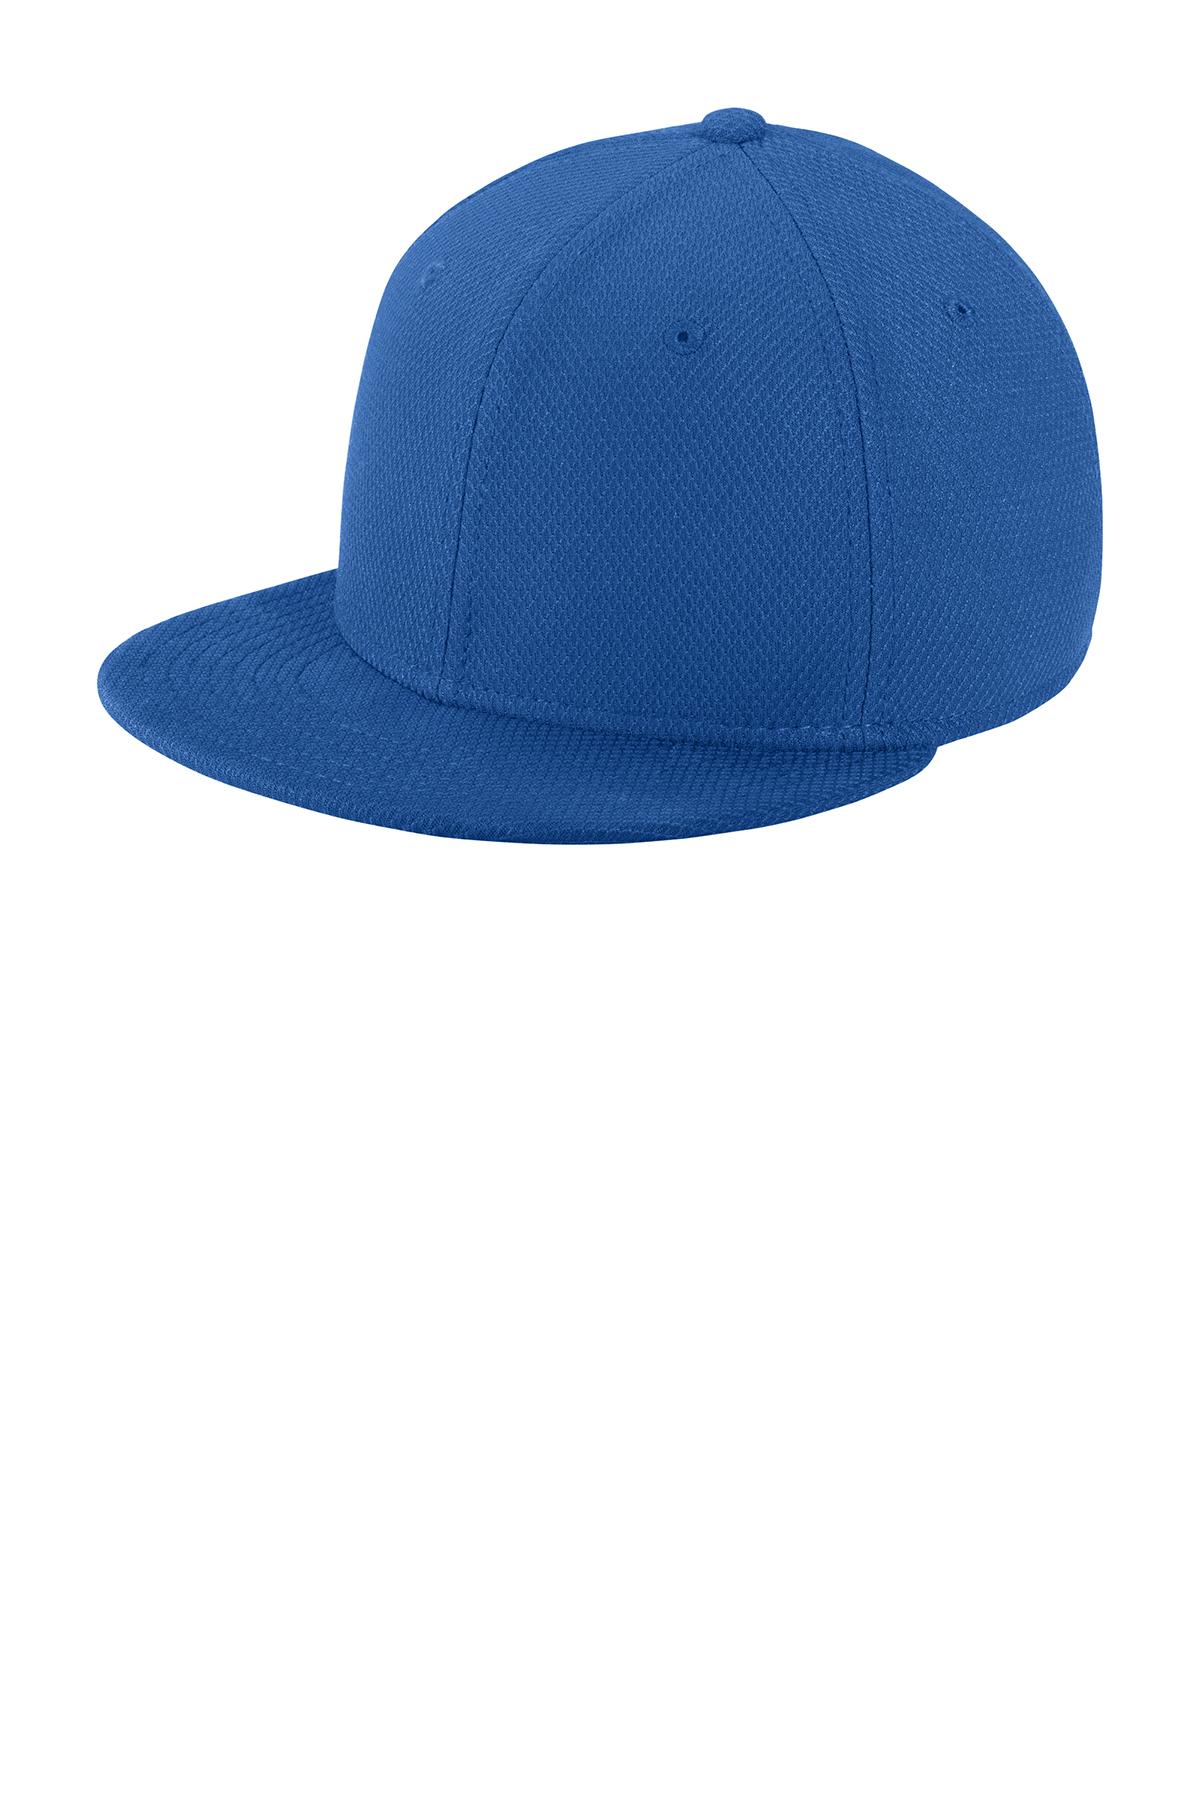 82de149e843 New Era® Youth Original Fit Diamond Era Flat Bill Snapback Cap. Brand Logo